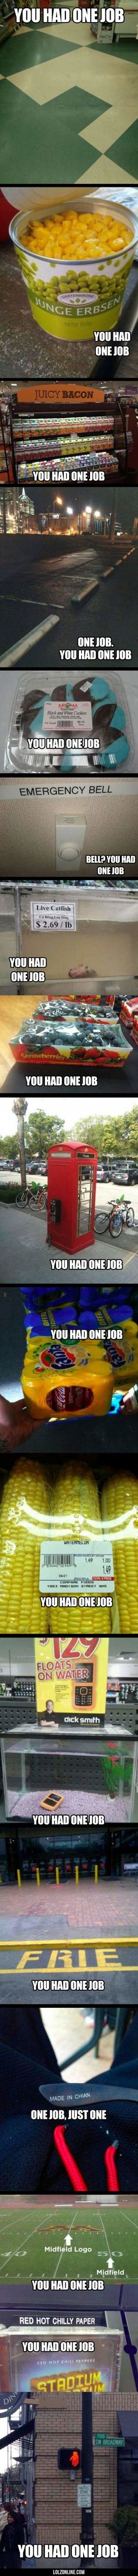 You had one job…#funny #lol #lolzonline